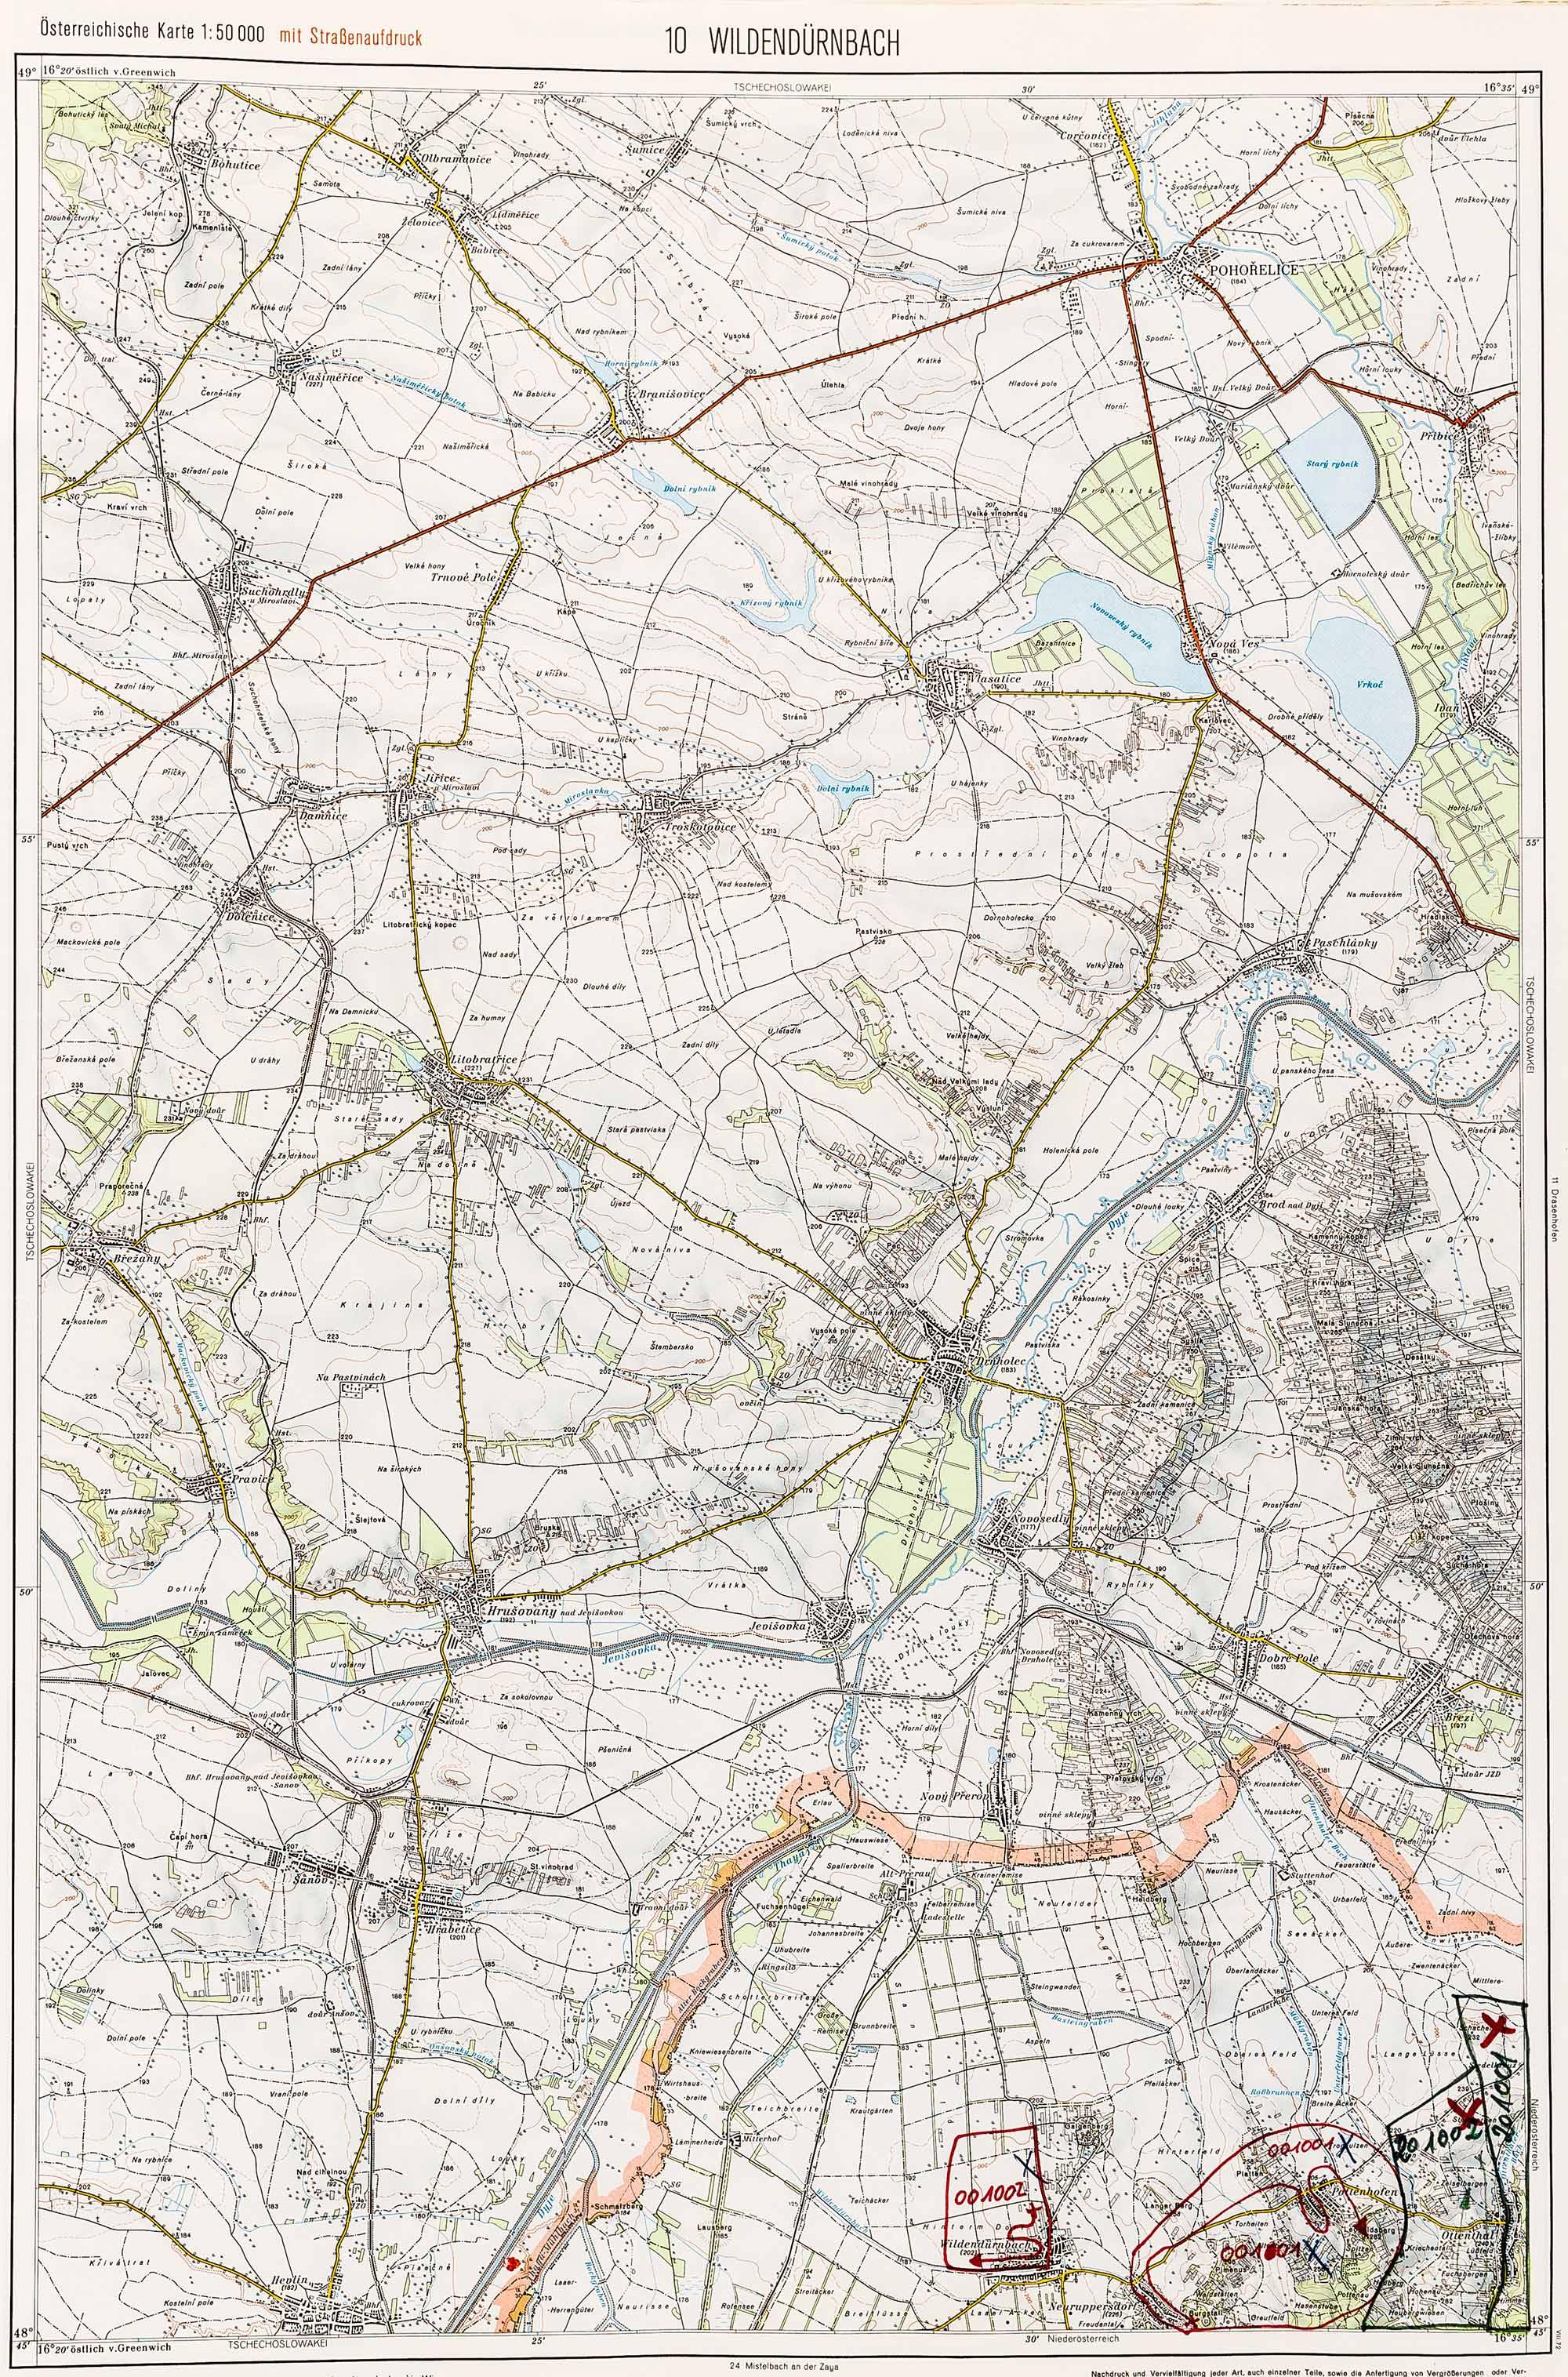 1979-1982 Karte 010